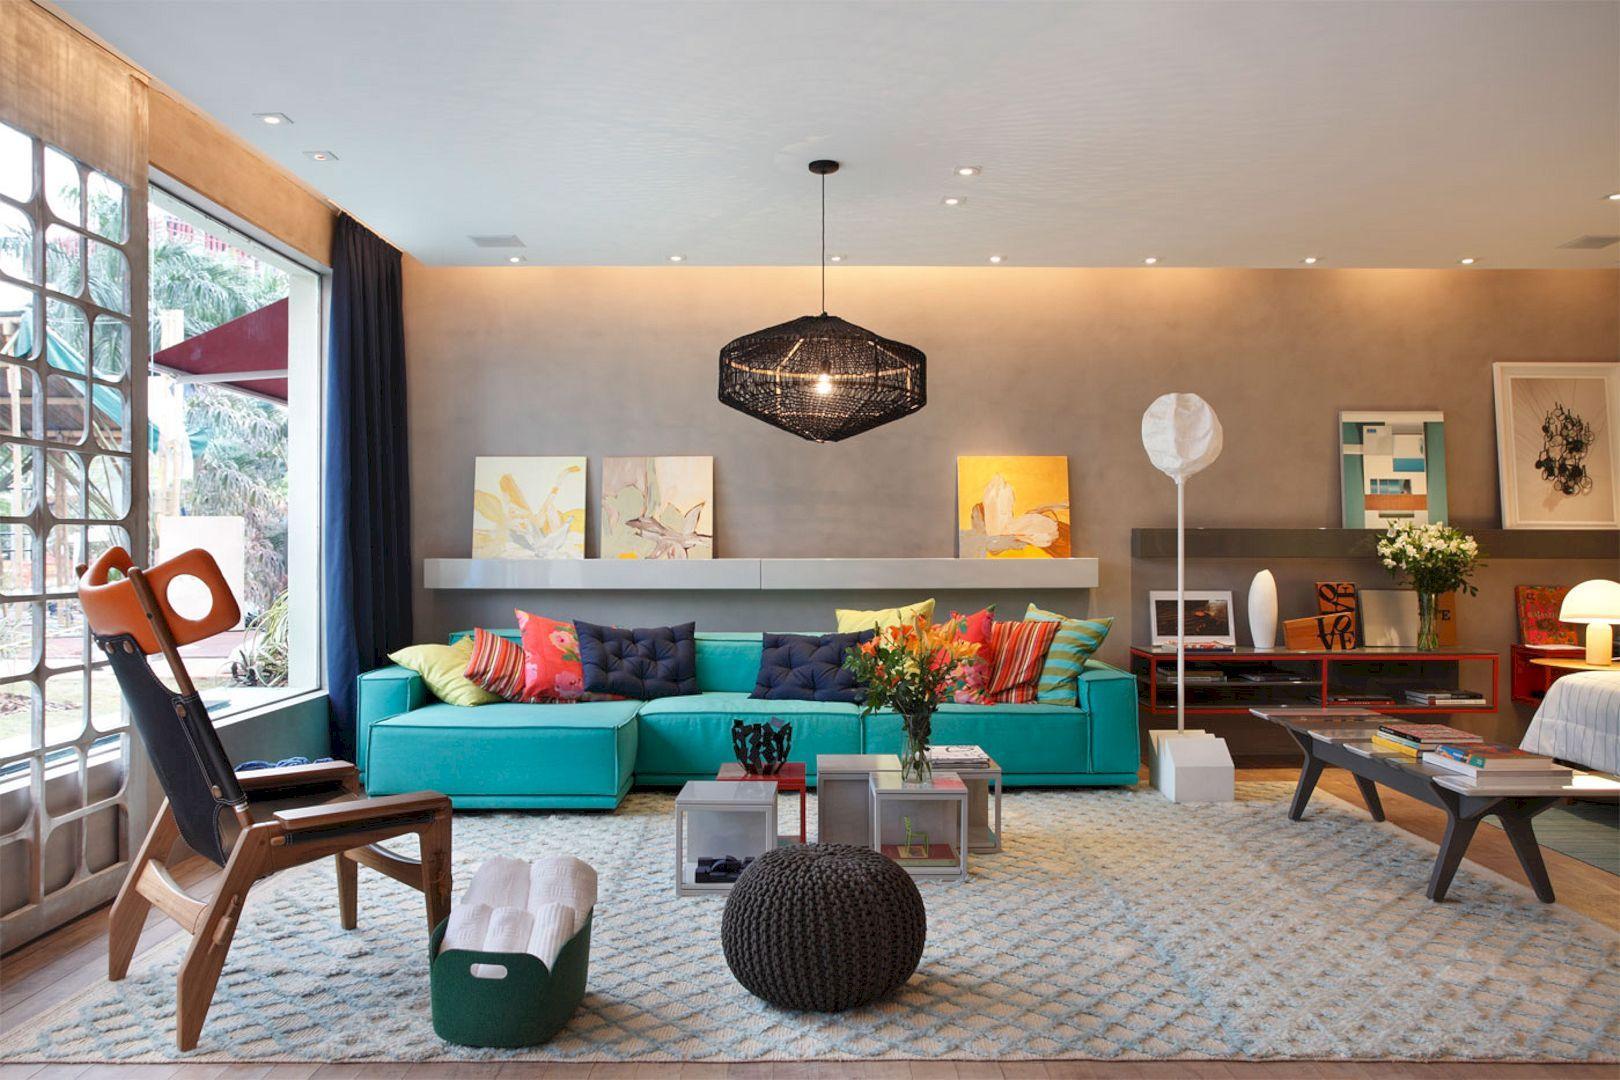 Interior Design Ideas for Your Living Room